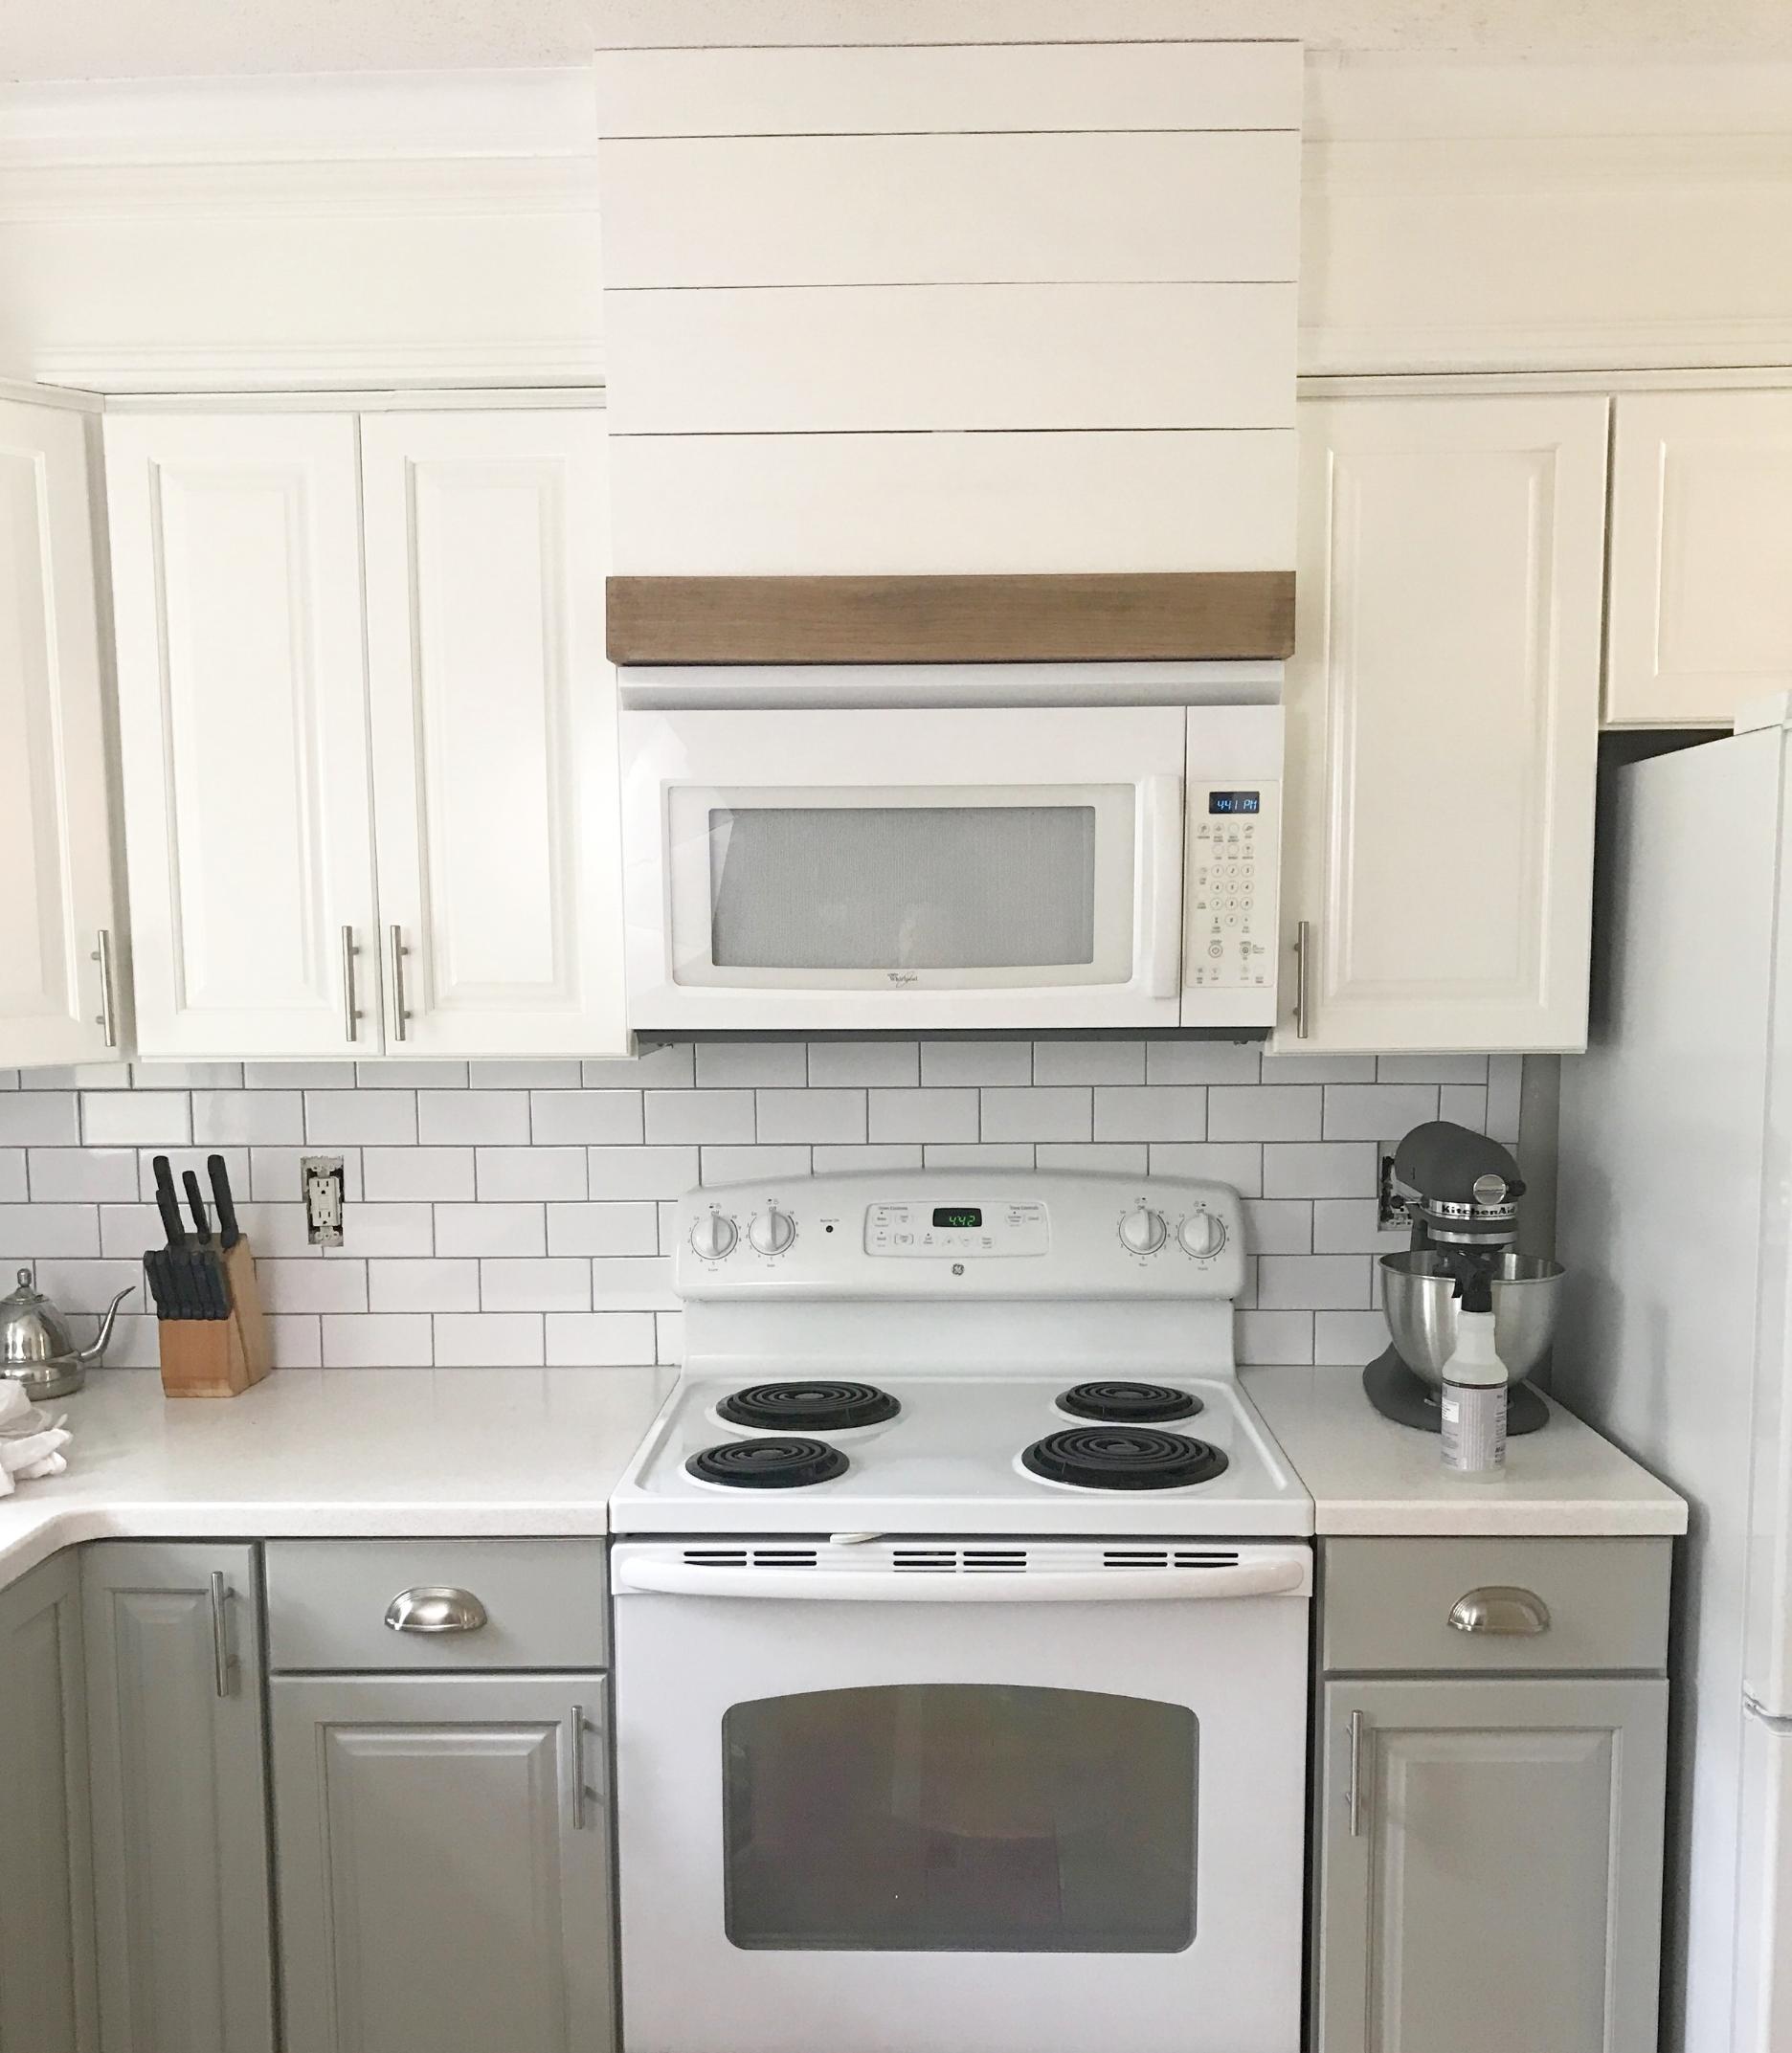 Faux Custom Hood Above Microwave DIY Kitchen Remodel